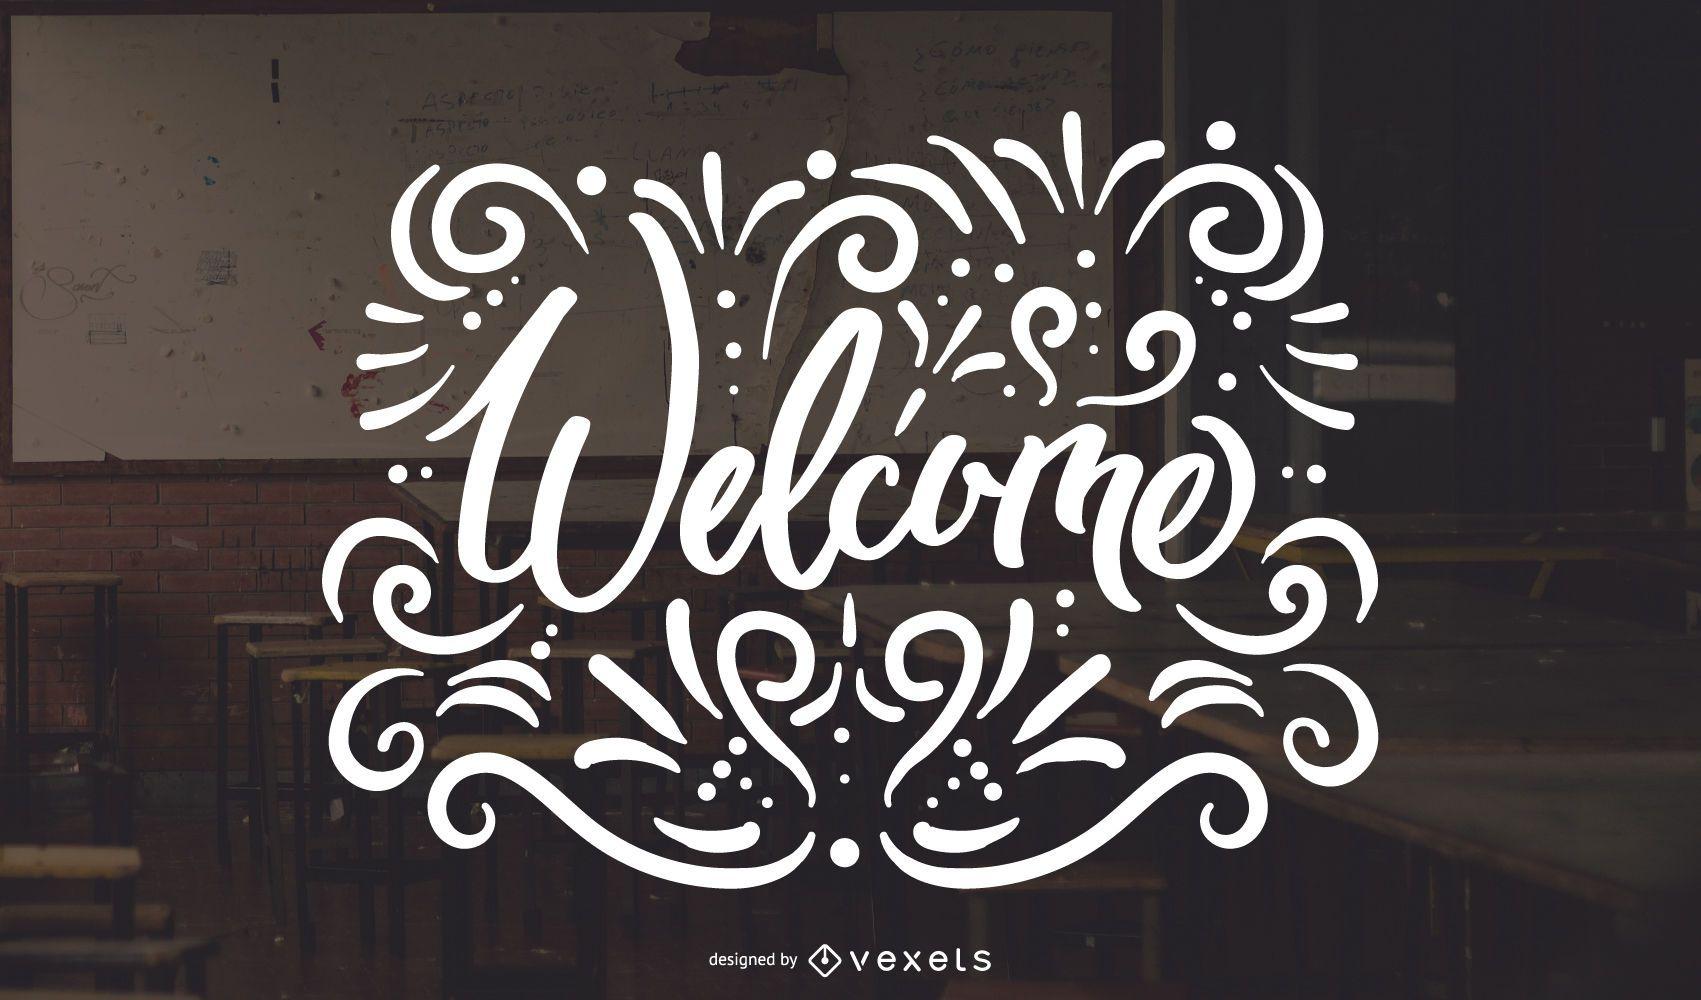 Welcome swirls lettering design